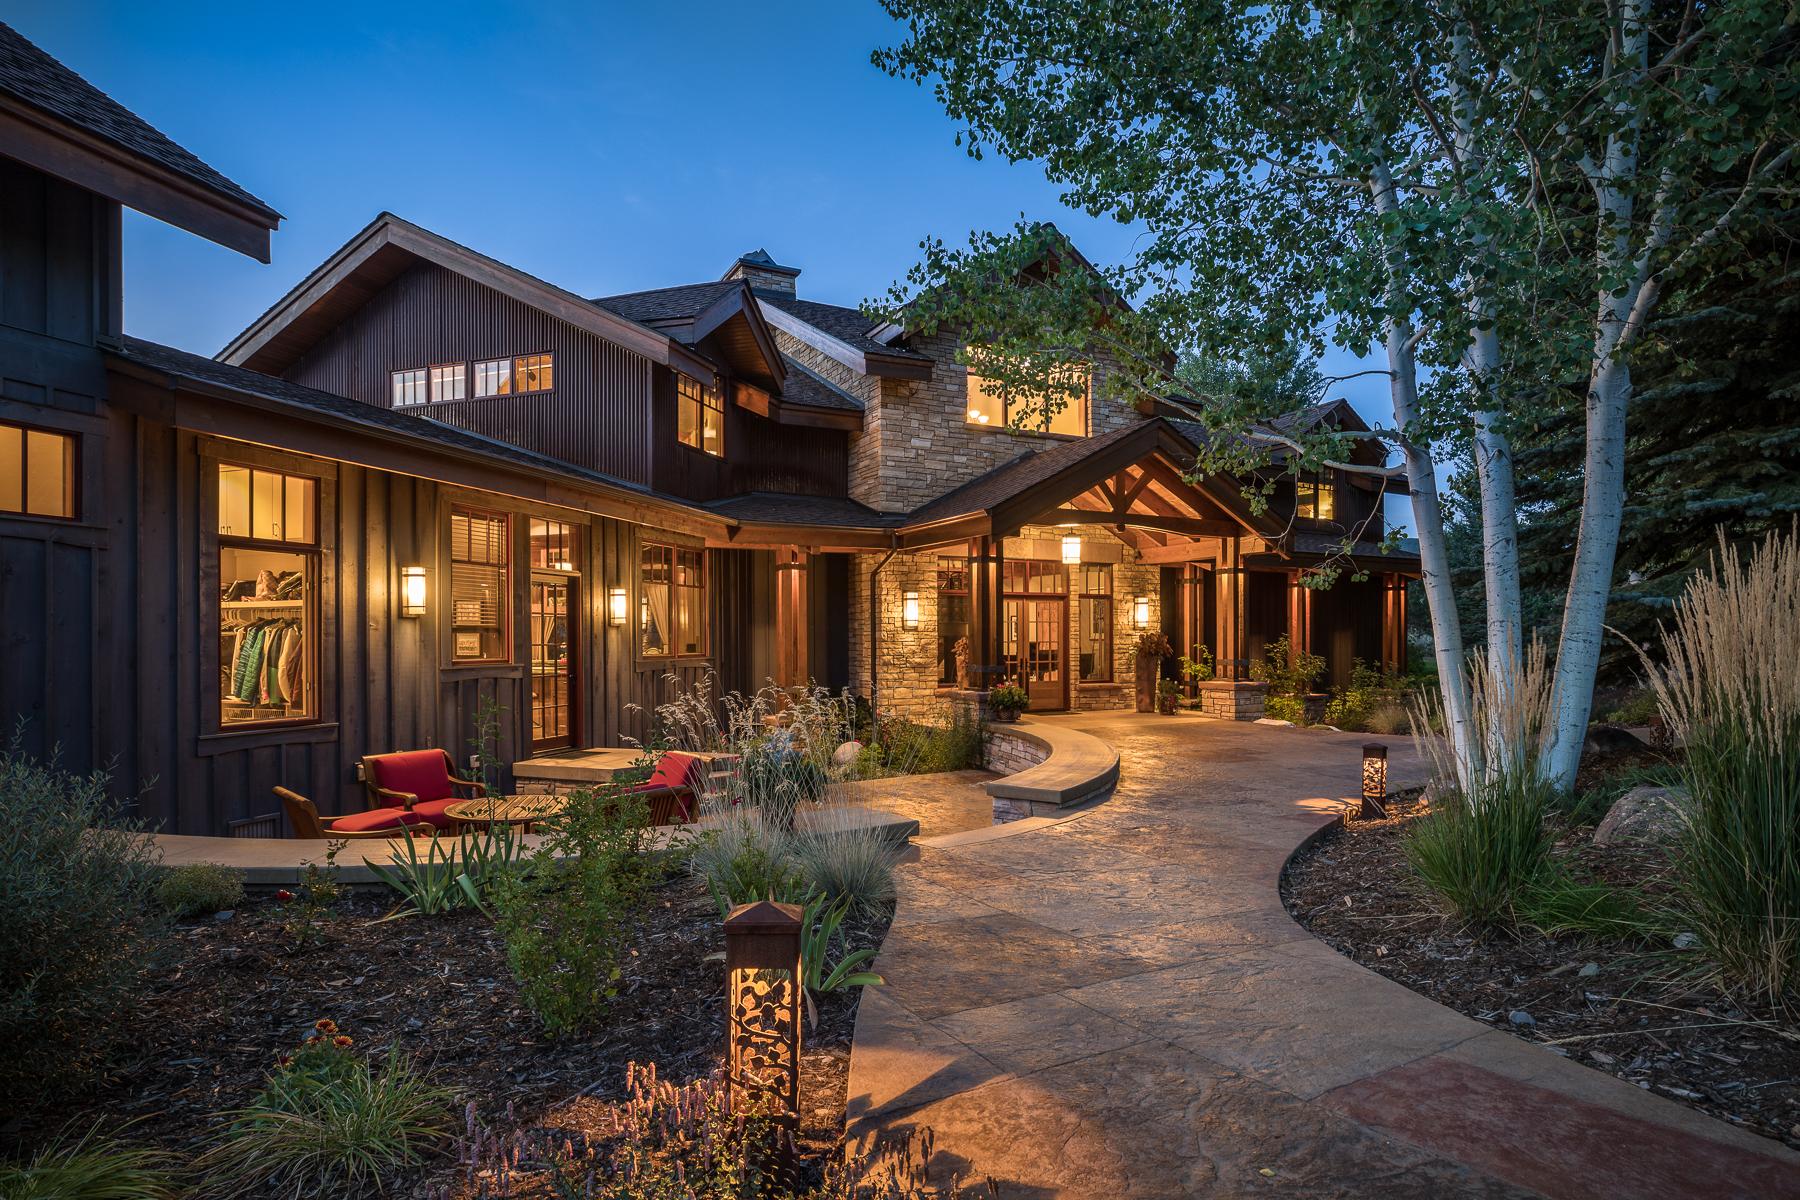 Single Family Home for Active at 280 Ball Lane 280 Ball Lane Durango, Colorado 81301 United States